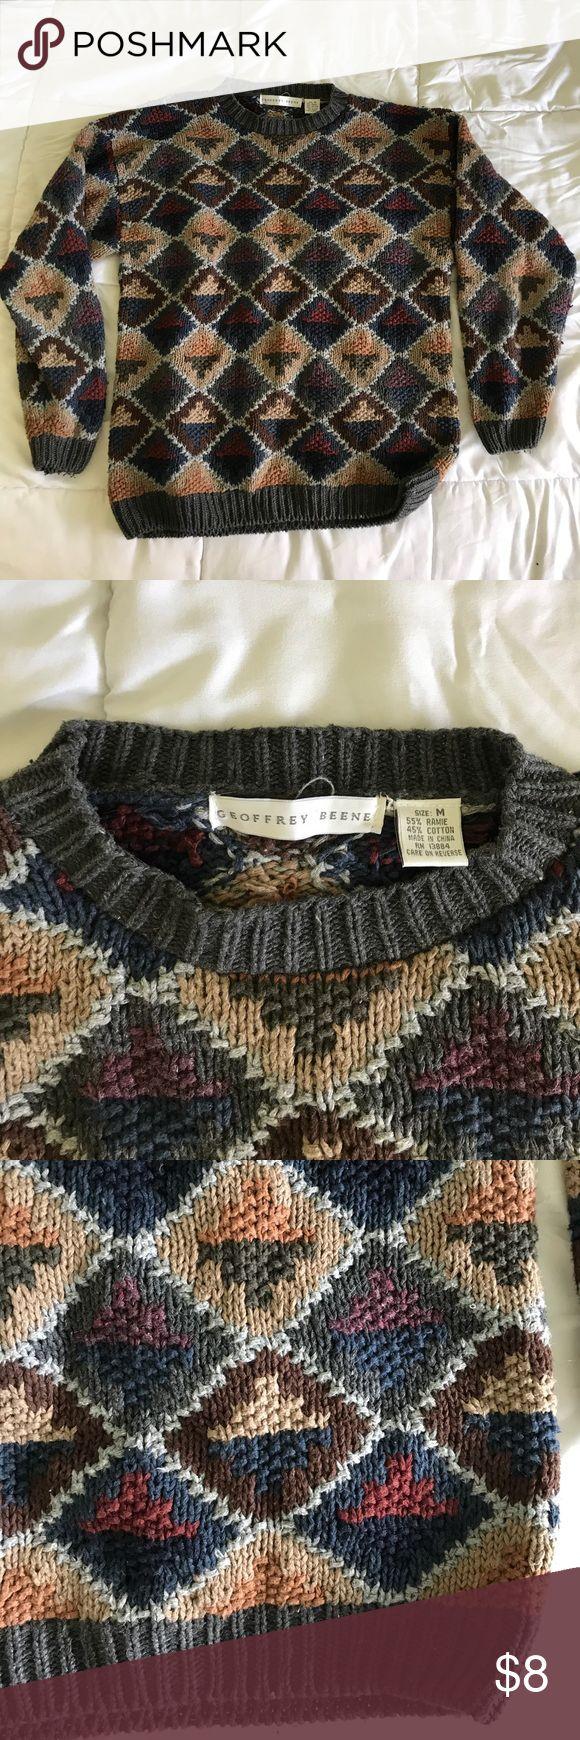 Vintage Oversized Grandpa Sweater Geoffrey Beene pullover sweater - vintage size medium Geoffrey Beene Sweaters Crew & Scoop Necks